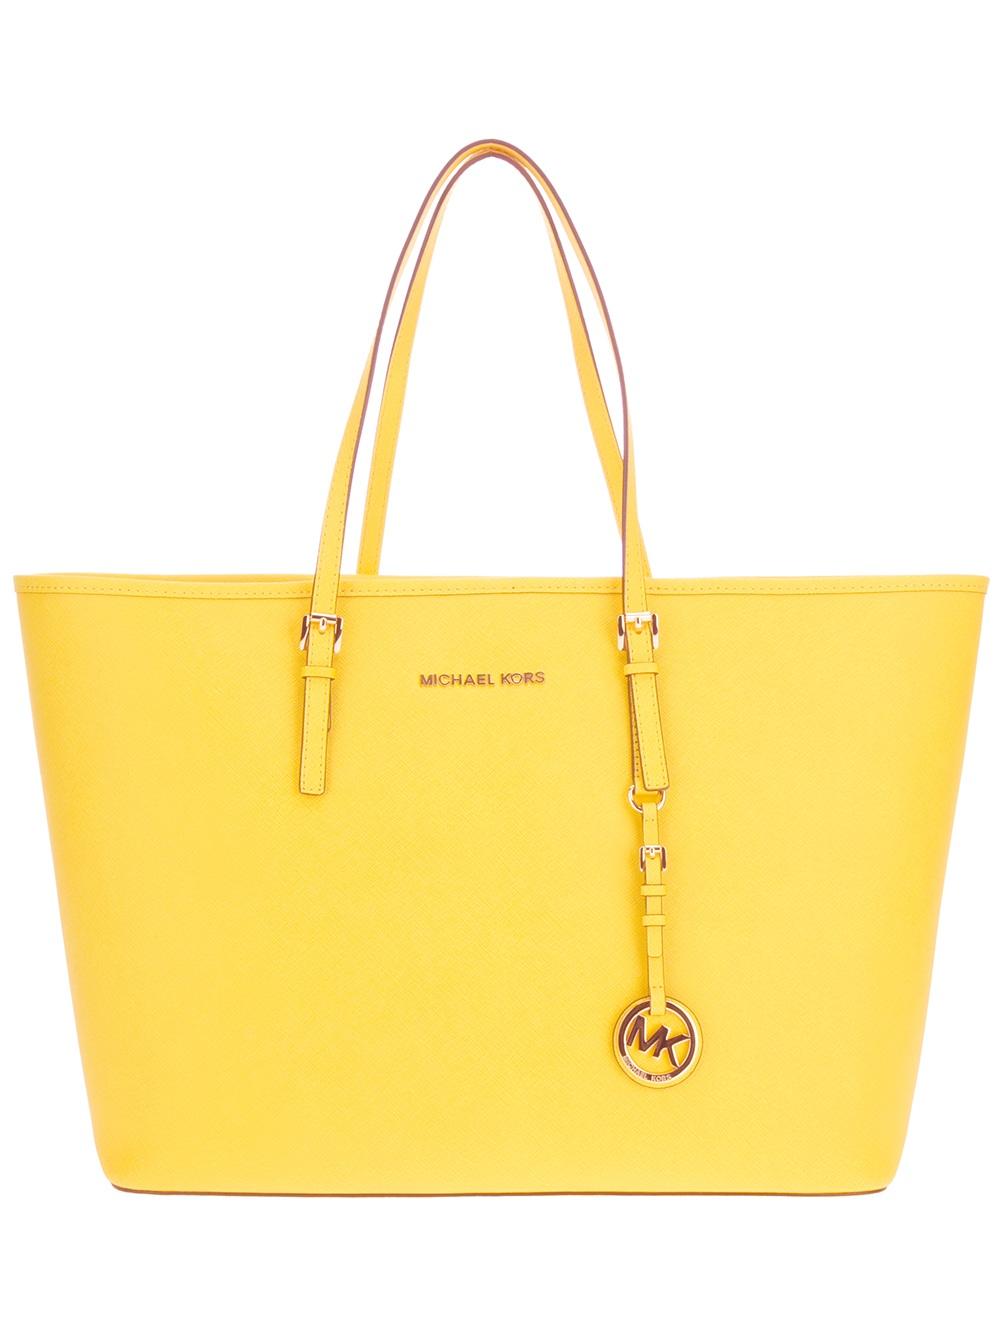 497479388f Michael Kors Shopper Tote in Yellow - Lyst